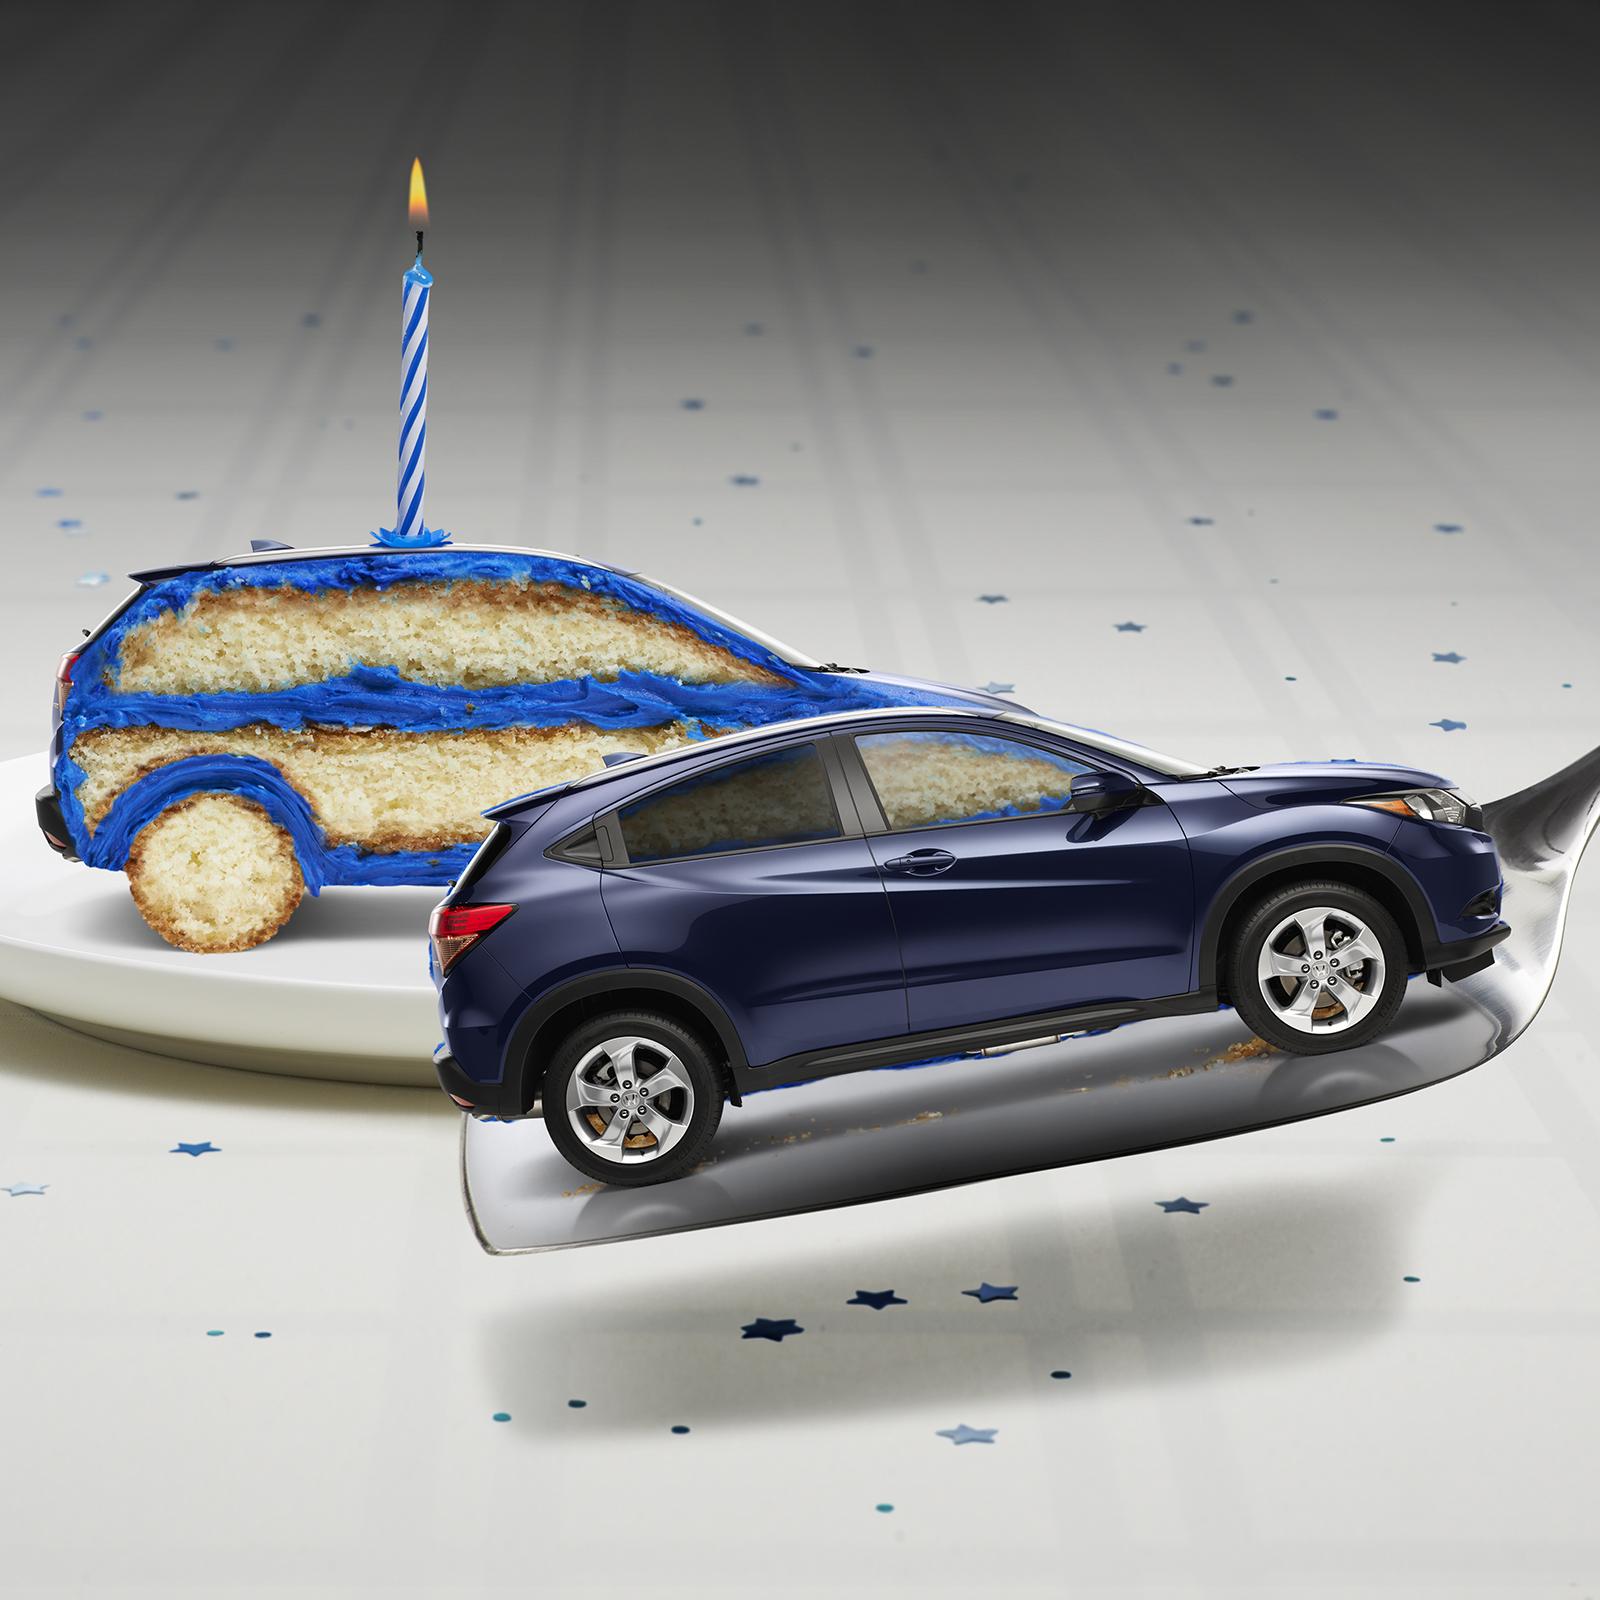 Honda_VR_Party_Cake_sRGB.jpg